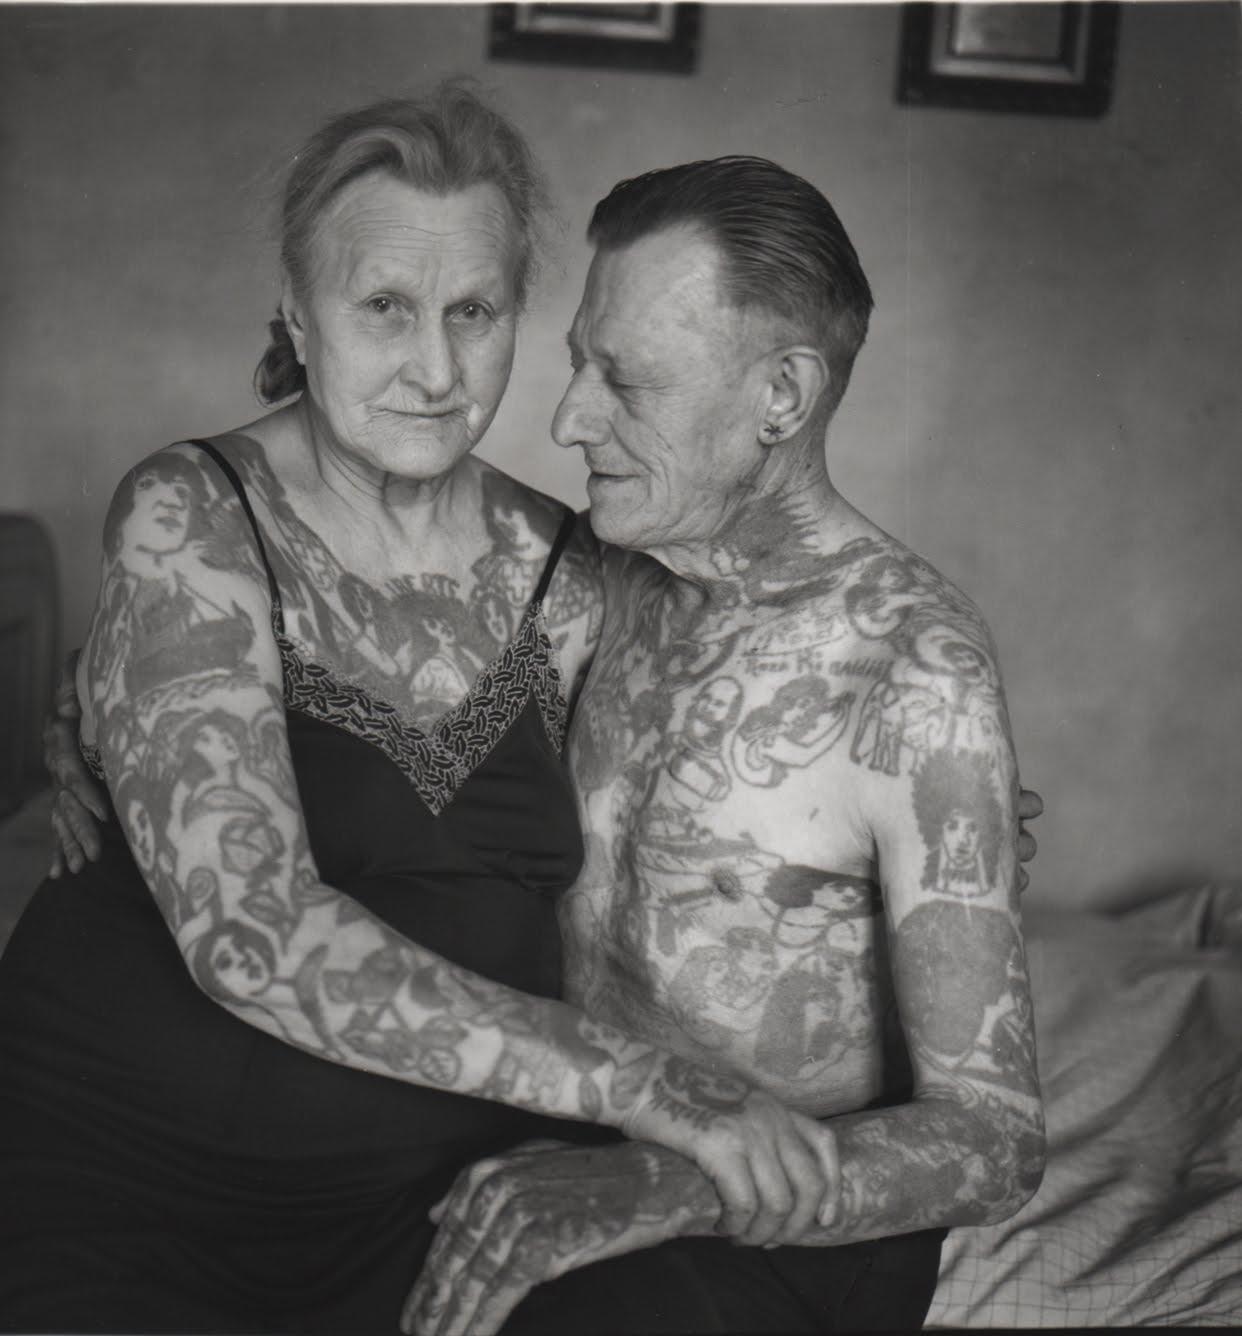 Adultos Mayores Que Responden Como Luciran Tus Tatuajes - Tatuajes-maores